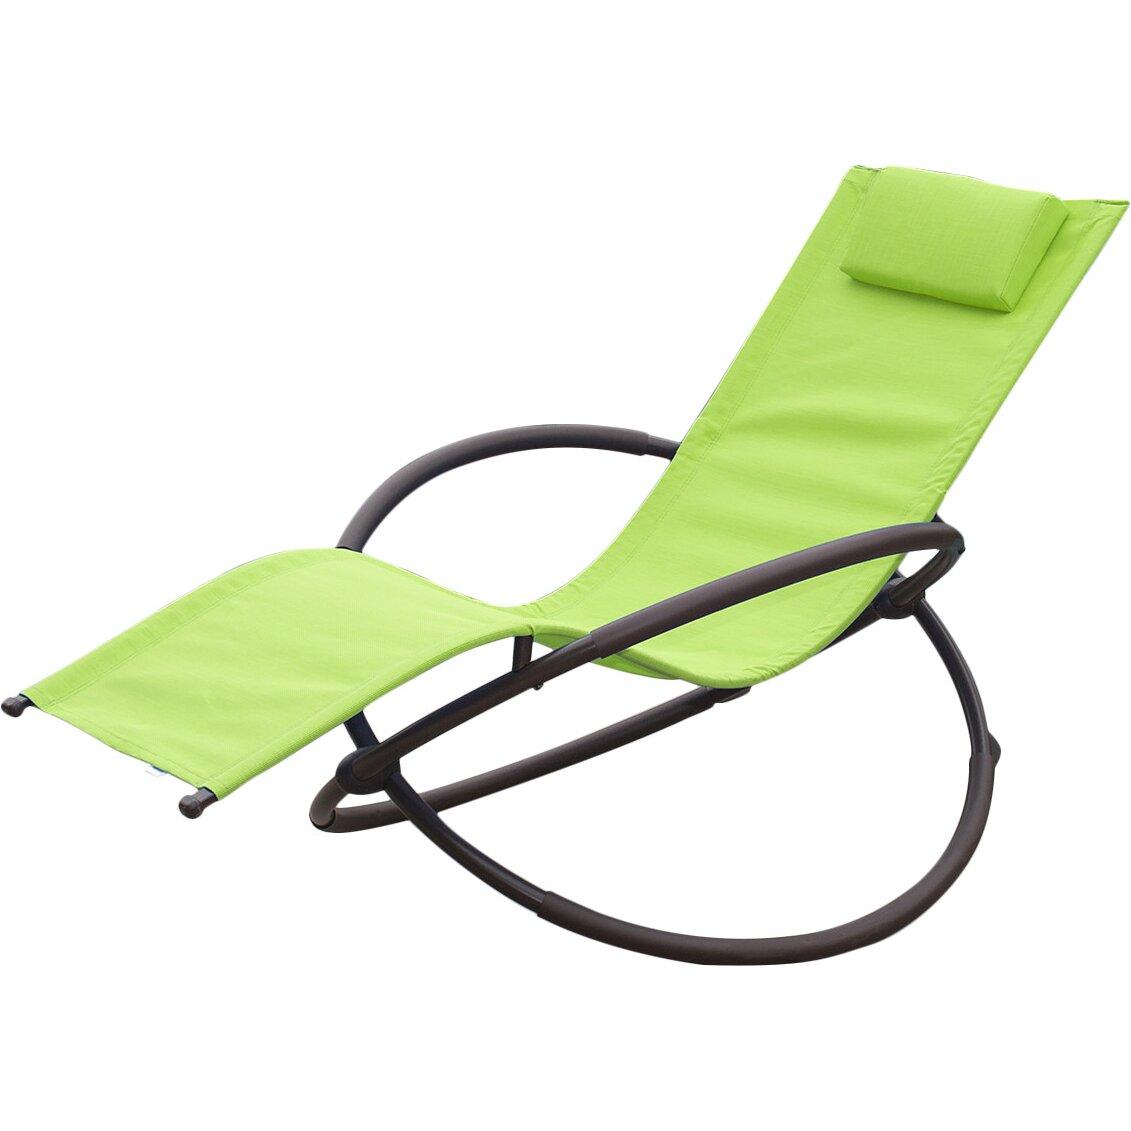 Belleze Orbital Chaise Lounge with Cushion & Reviews | Wayfair